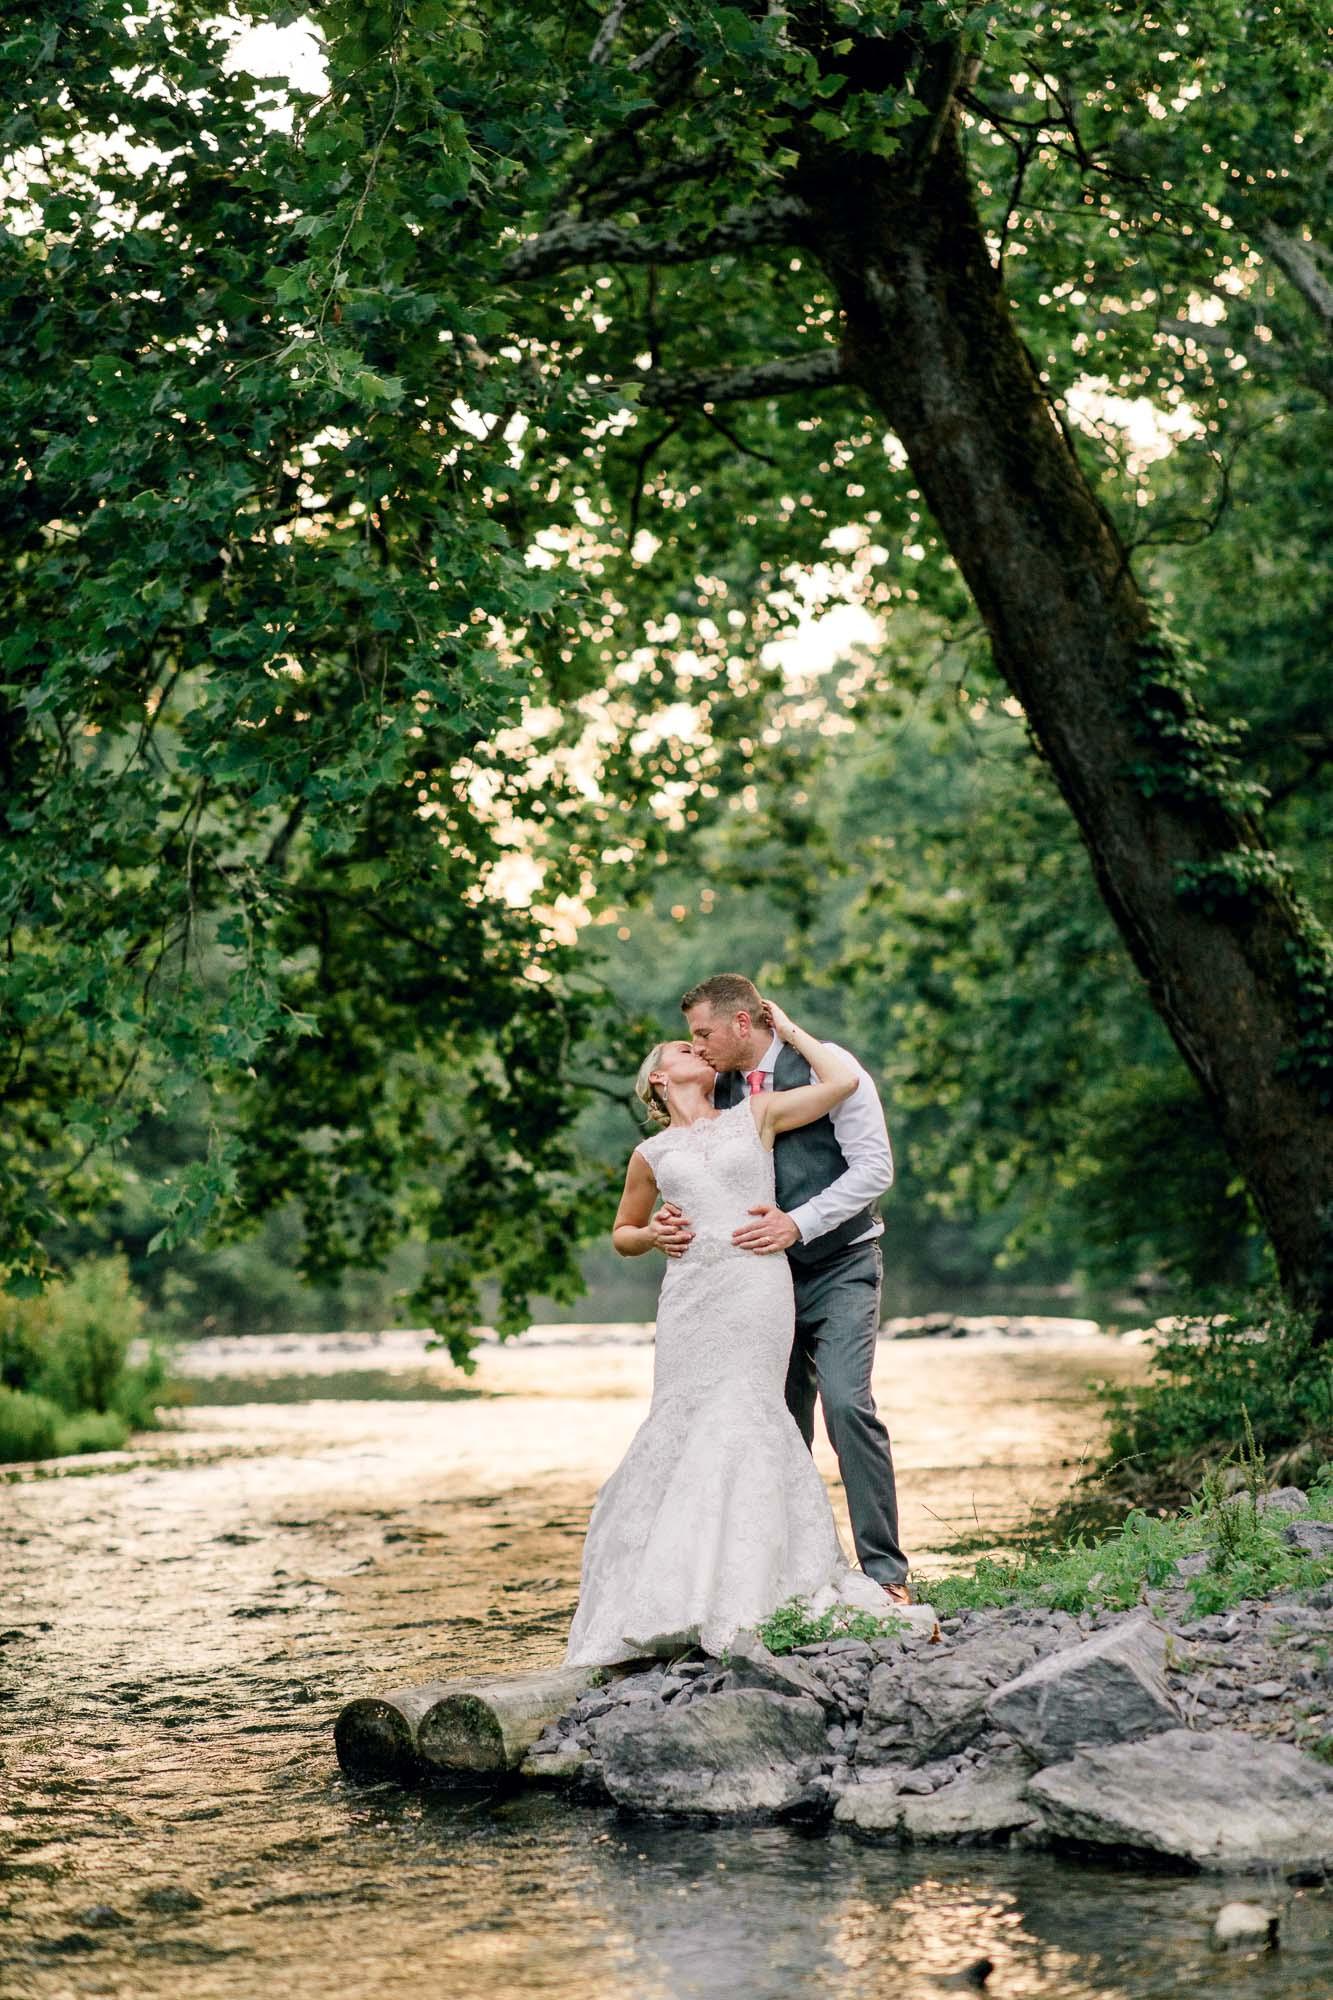 Allenberry-resort-historic-pennsylvania-wedding-22492.jpg